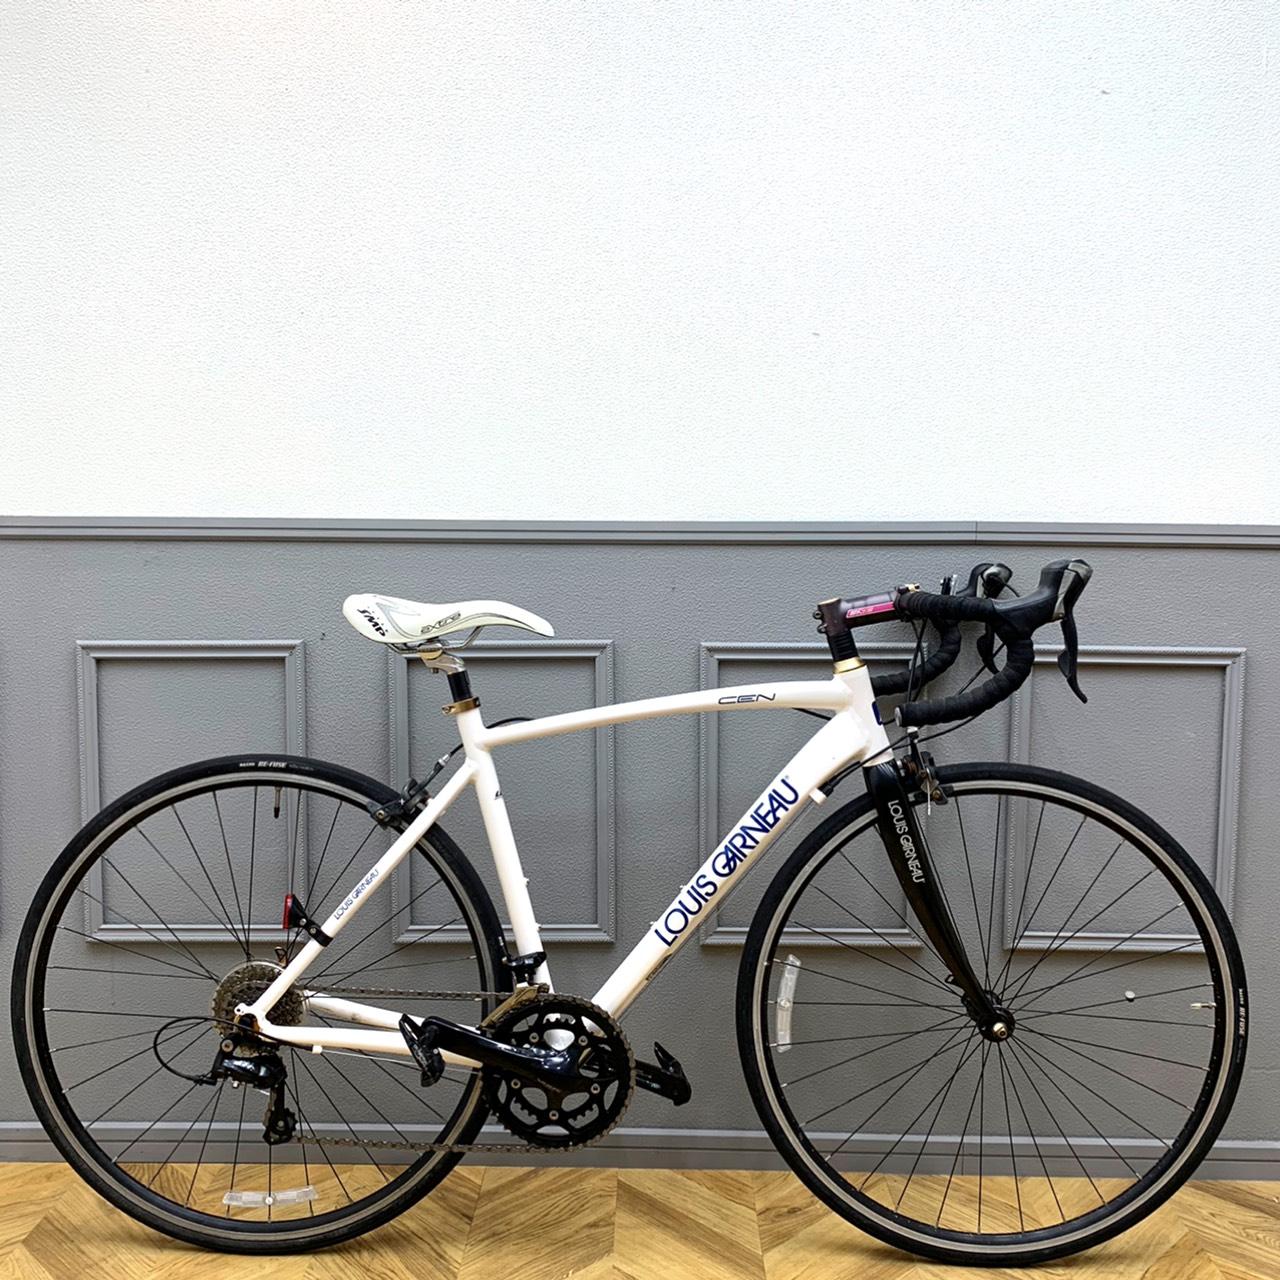 LOUIS GARNEAUルイガノ LGS-CEN 2014年モデル ロードバイク